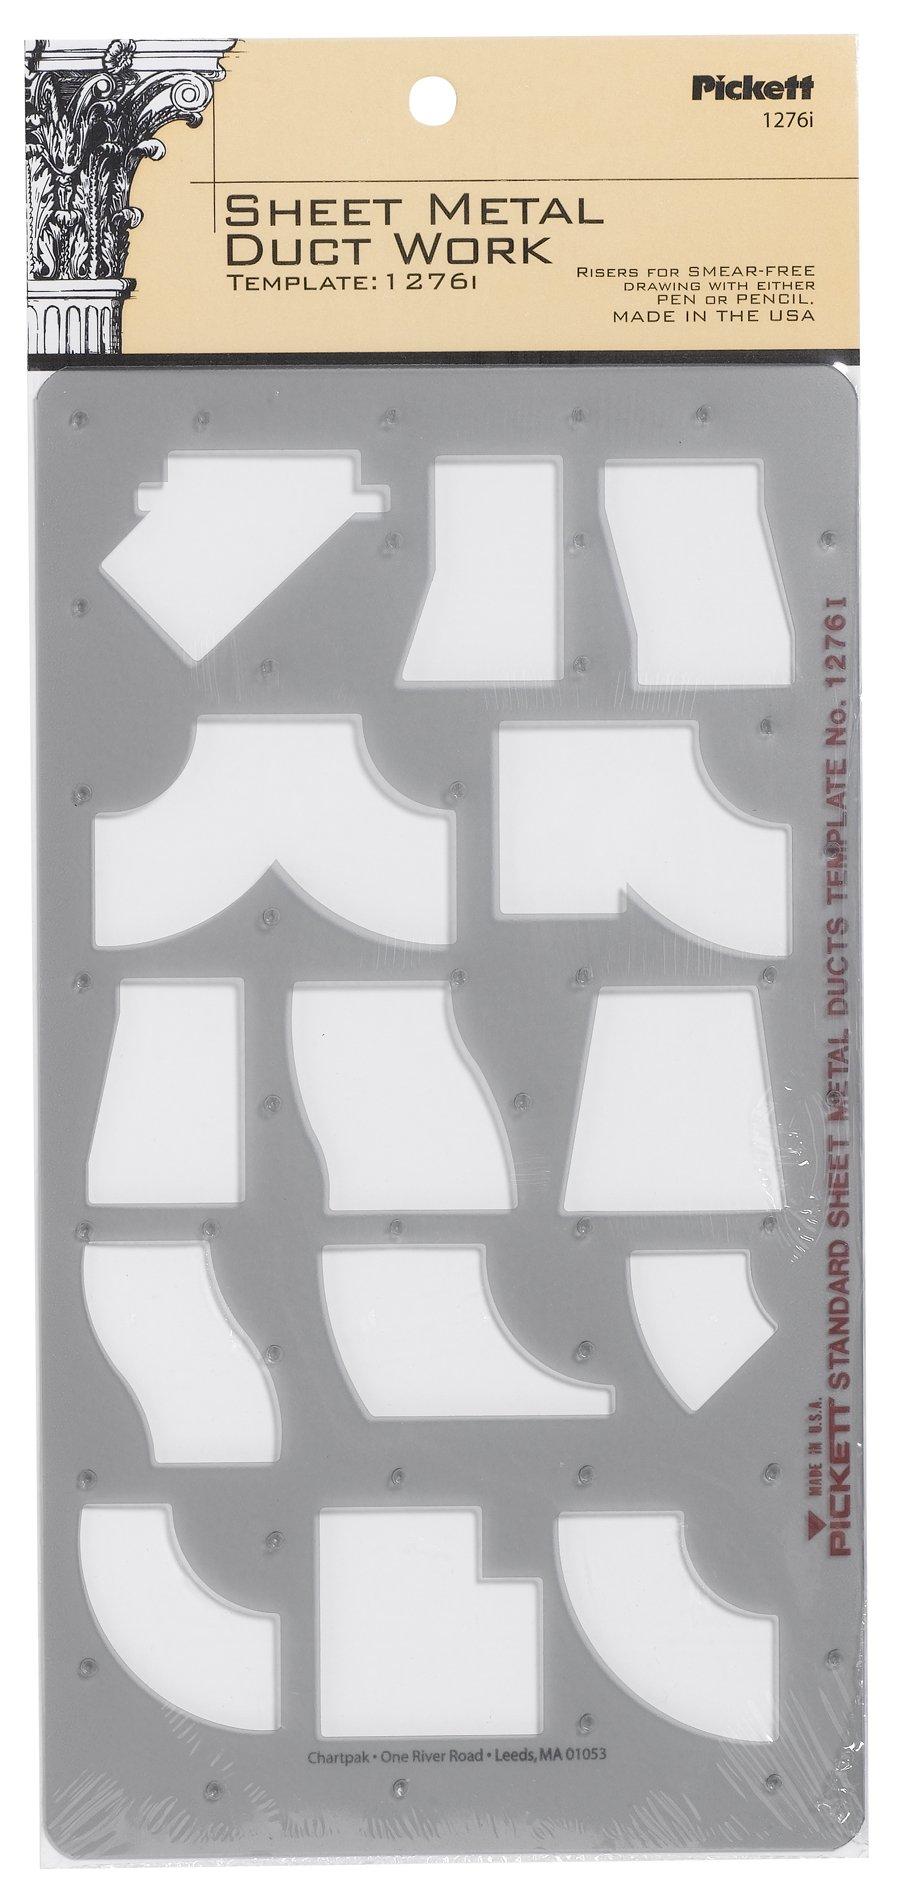 Pickett Sheet Metal Duct Work Template (1276I)